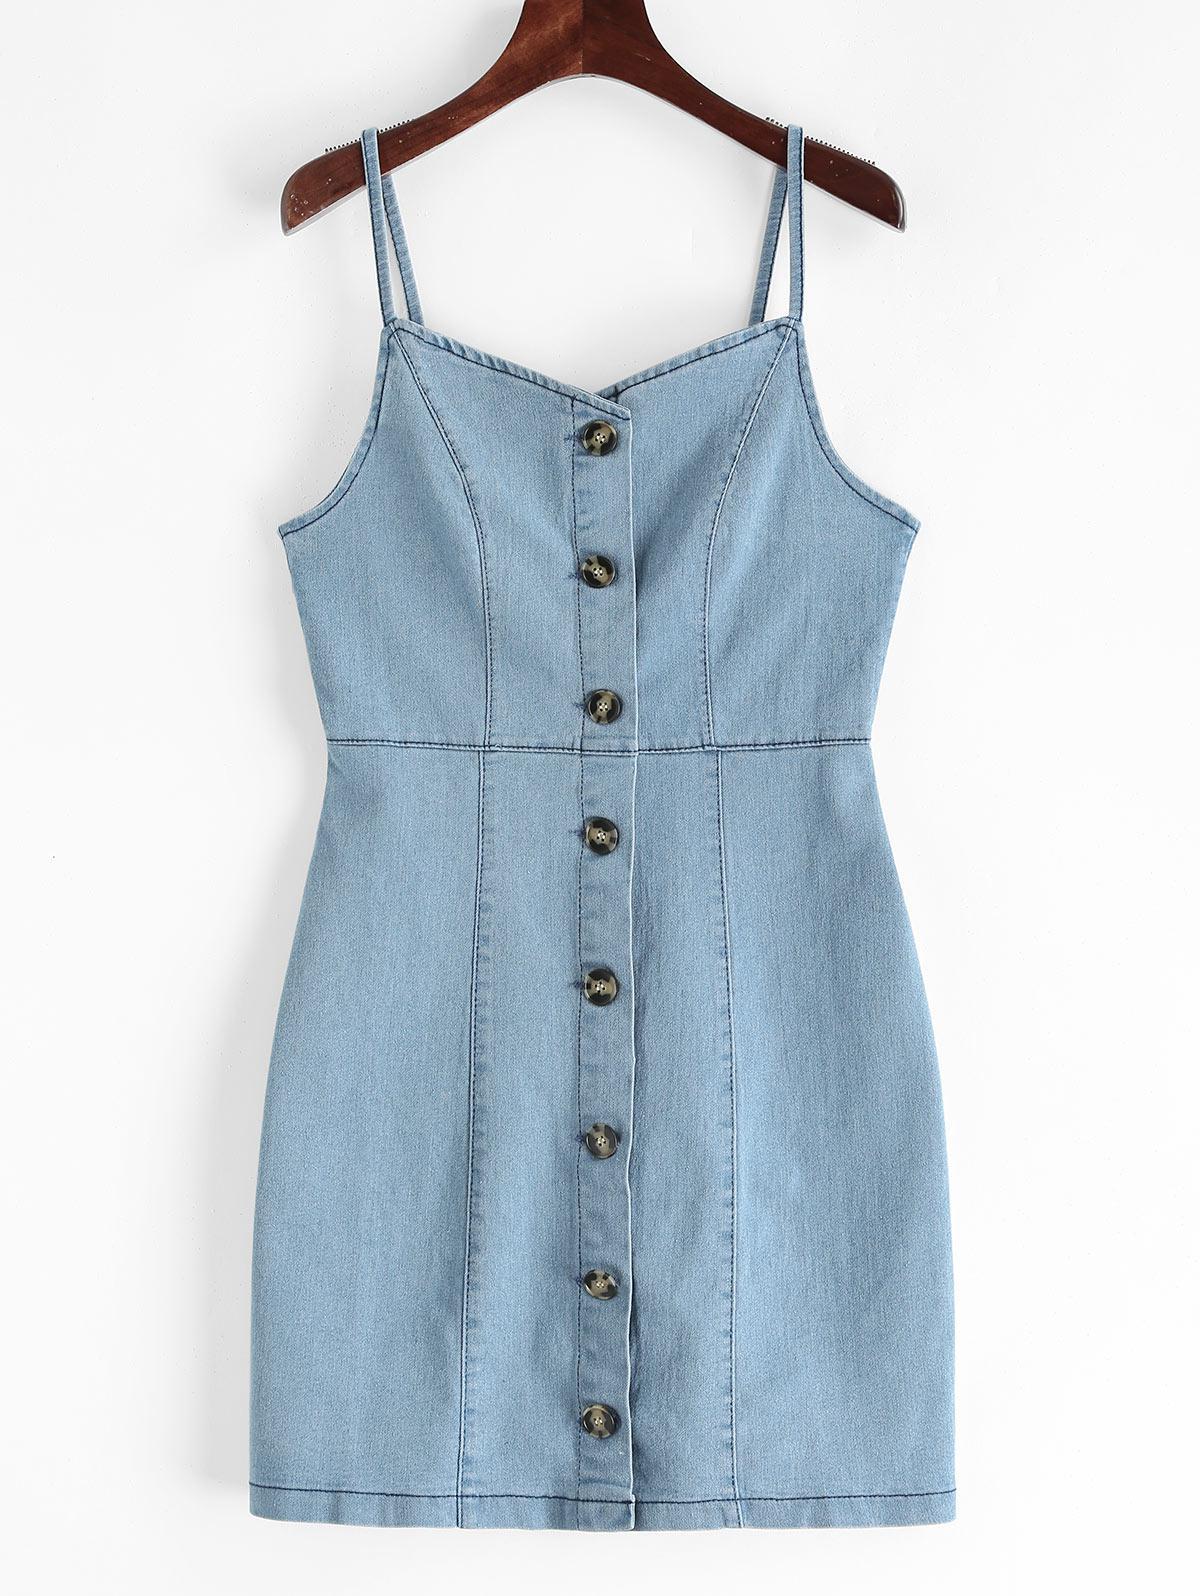 Button Up Sheath Denim Cami Dress, Jeans blue